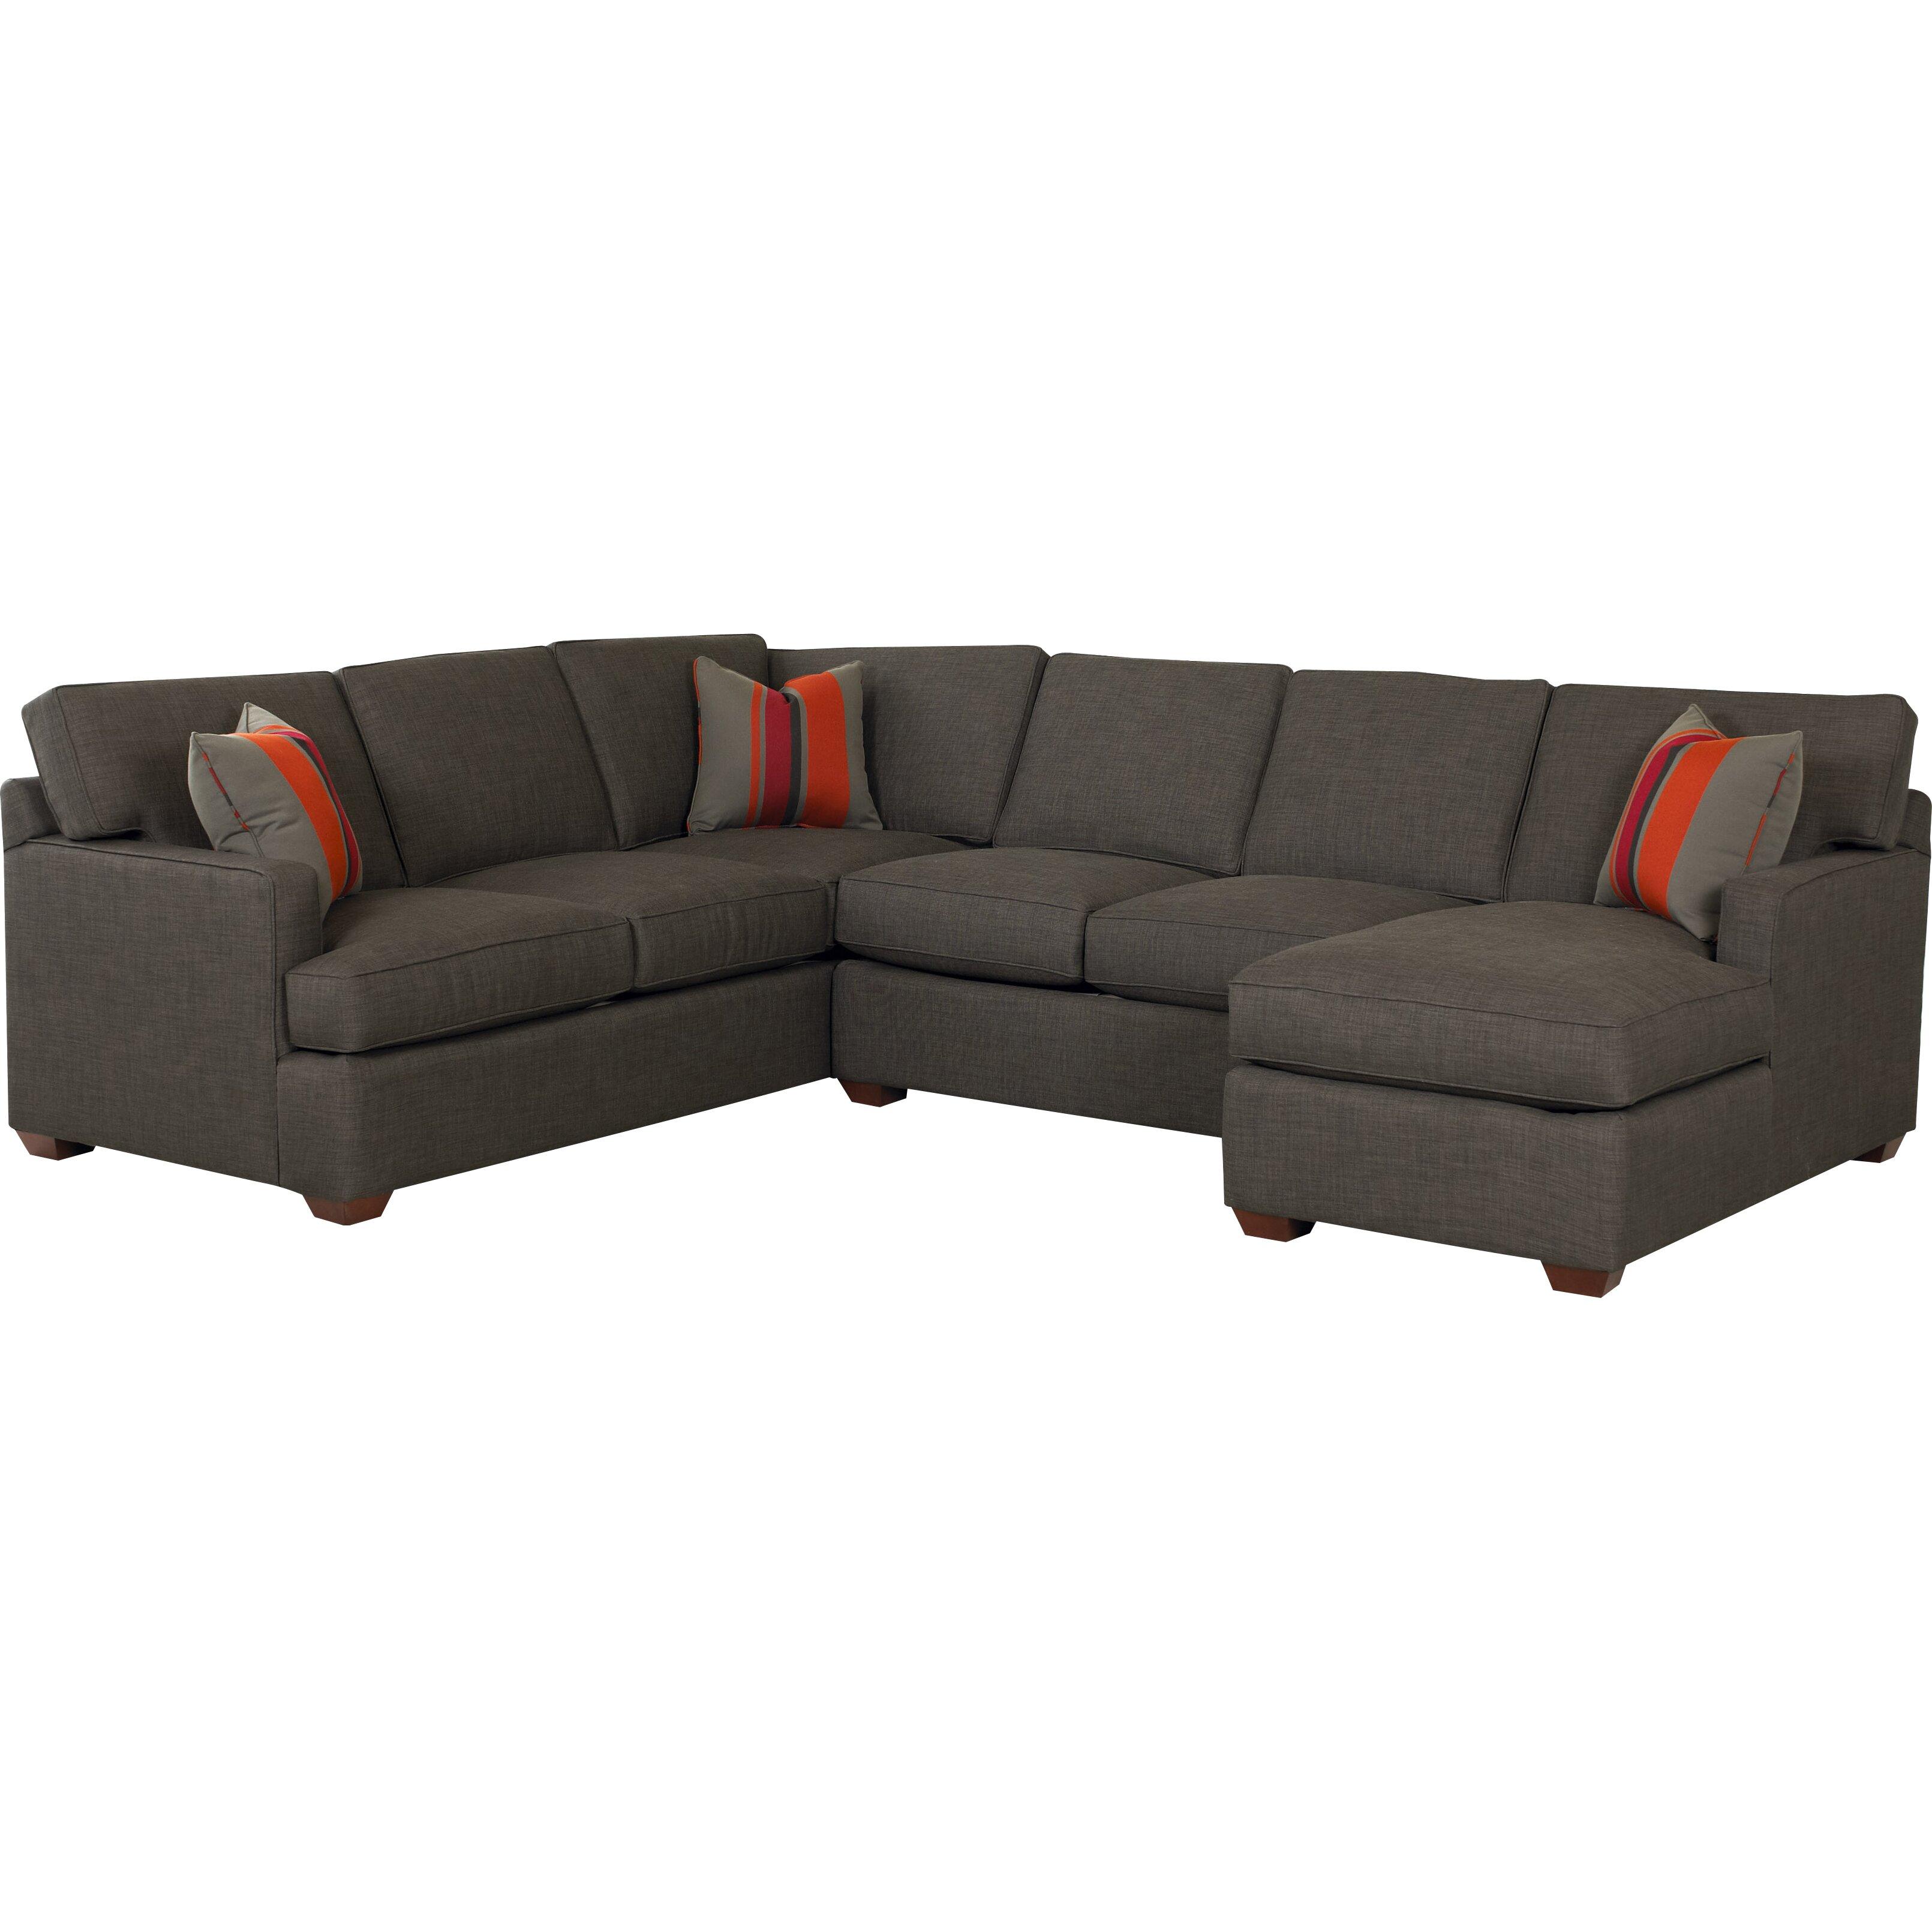 Klaussner Furniture Rory Sectional u0026 Reviews : Wayfair.ca